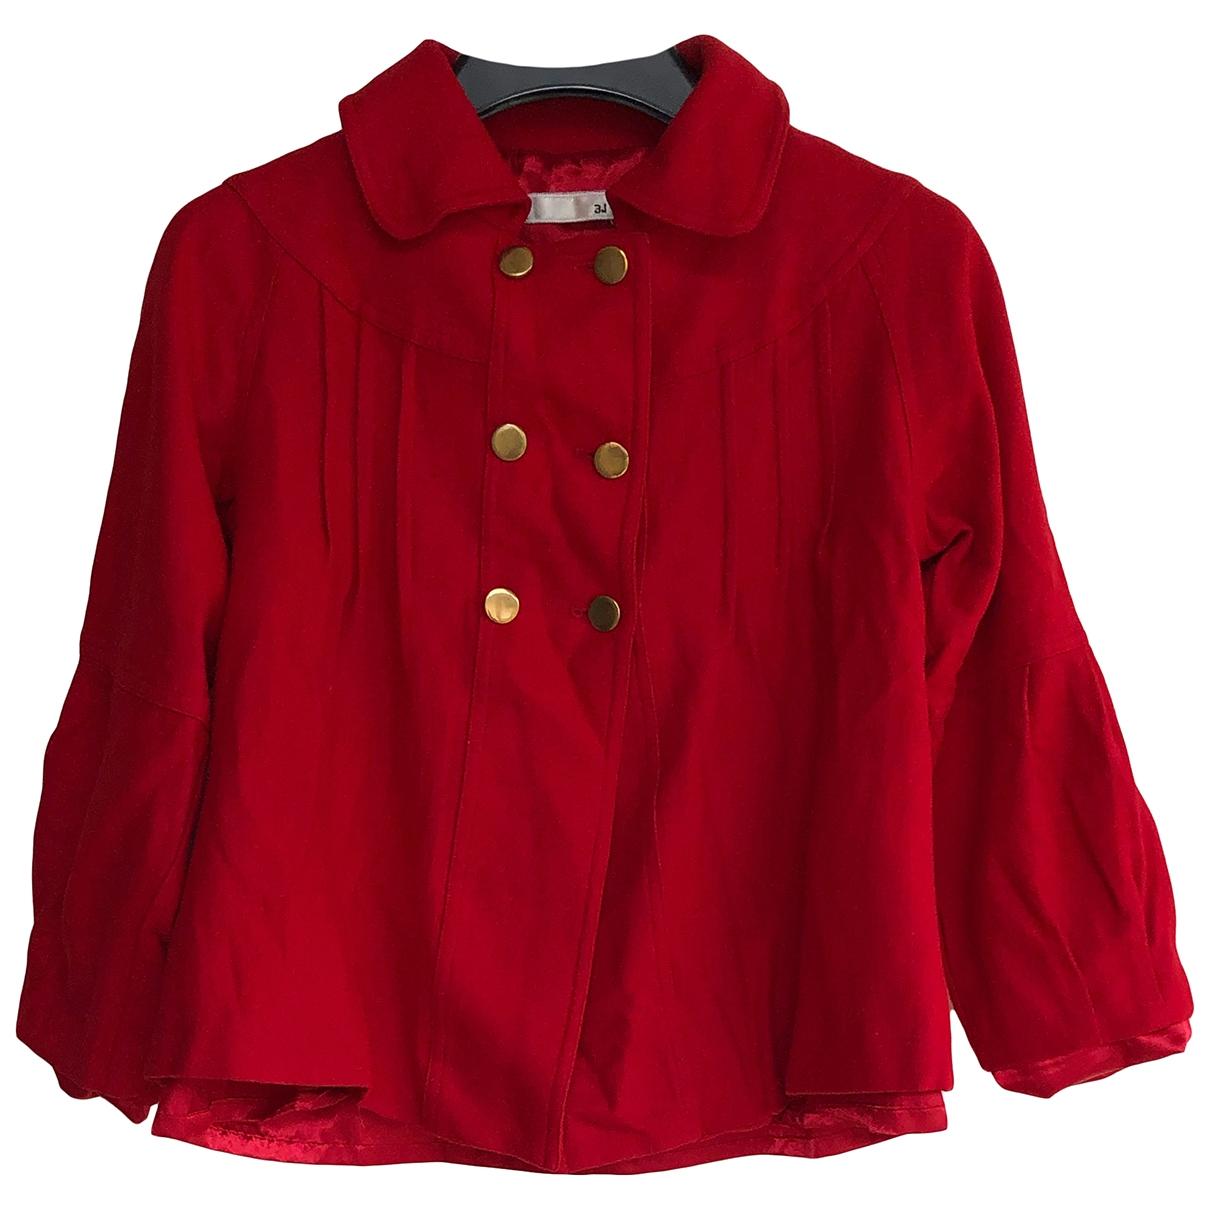 3.1 Phillip Lim \N Red Wool jacket for Women 4 UK